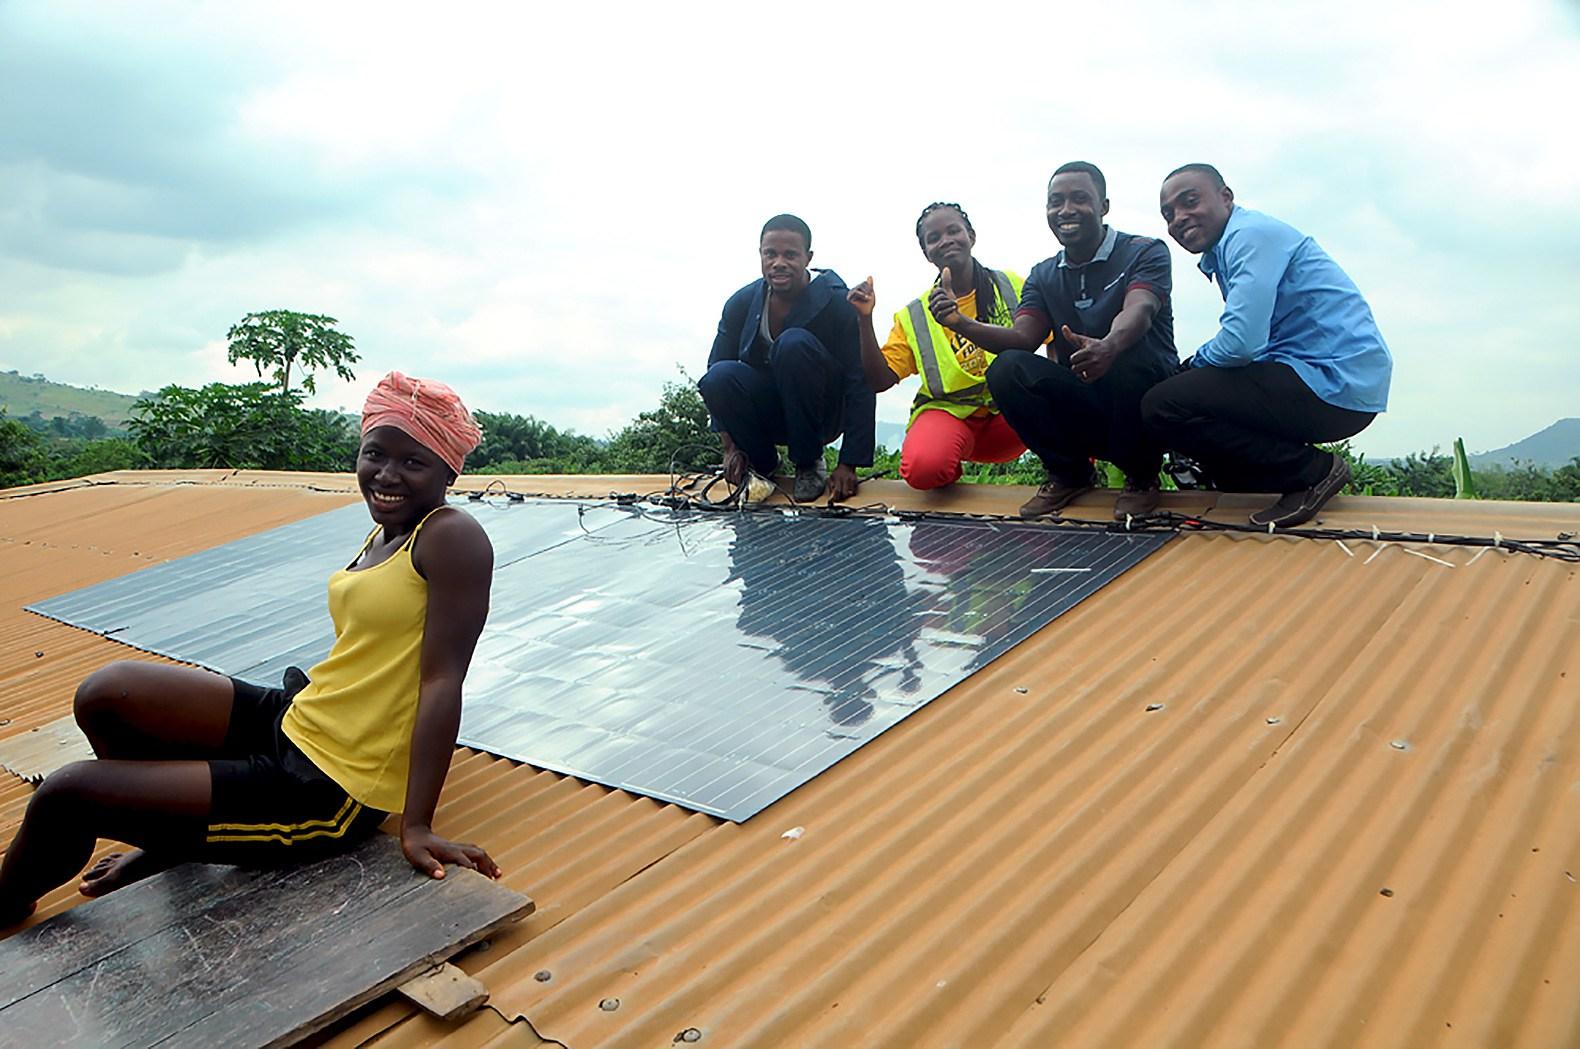 Sun Flare: pannelli fotovoltaici flessibili a pellicola sottile